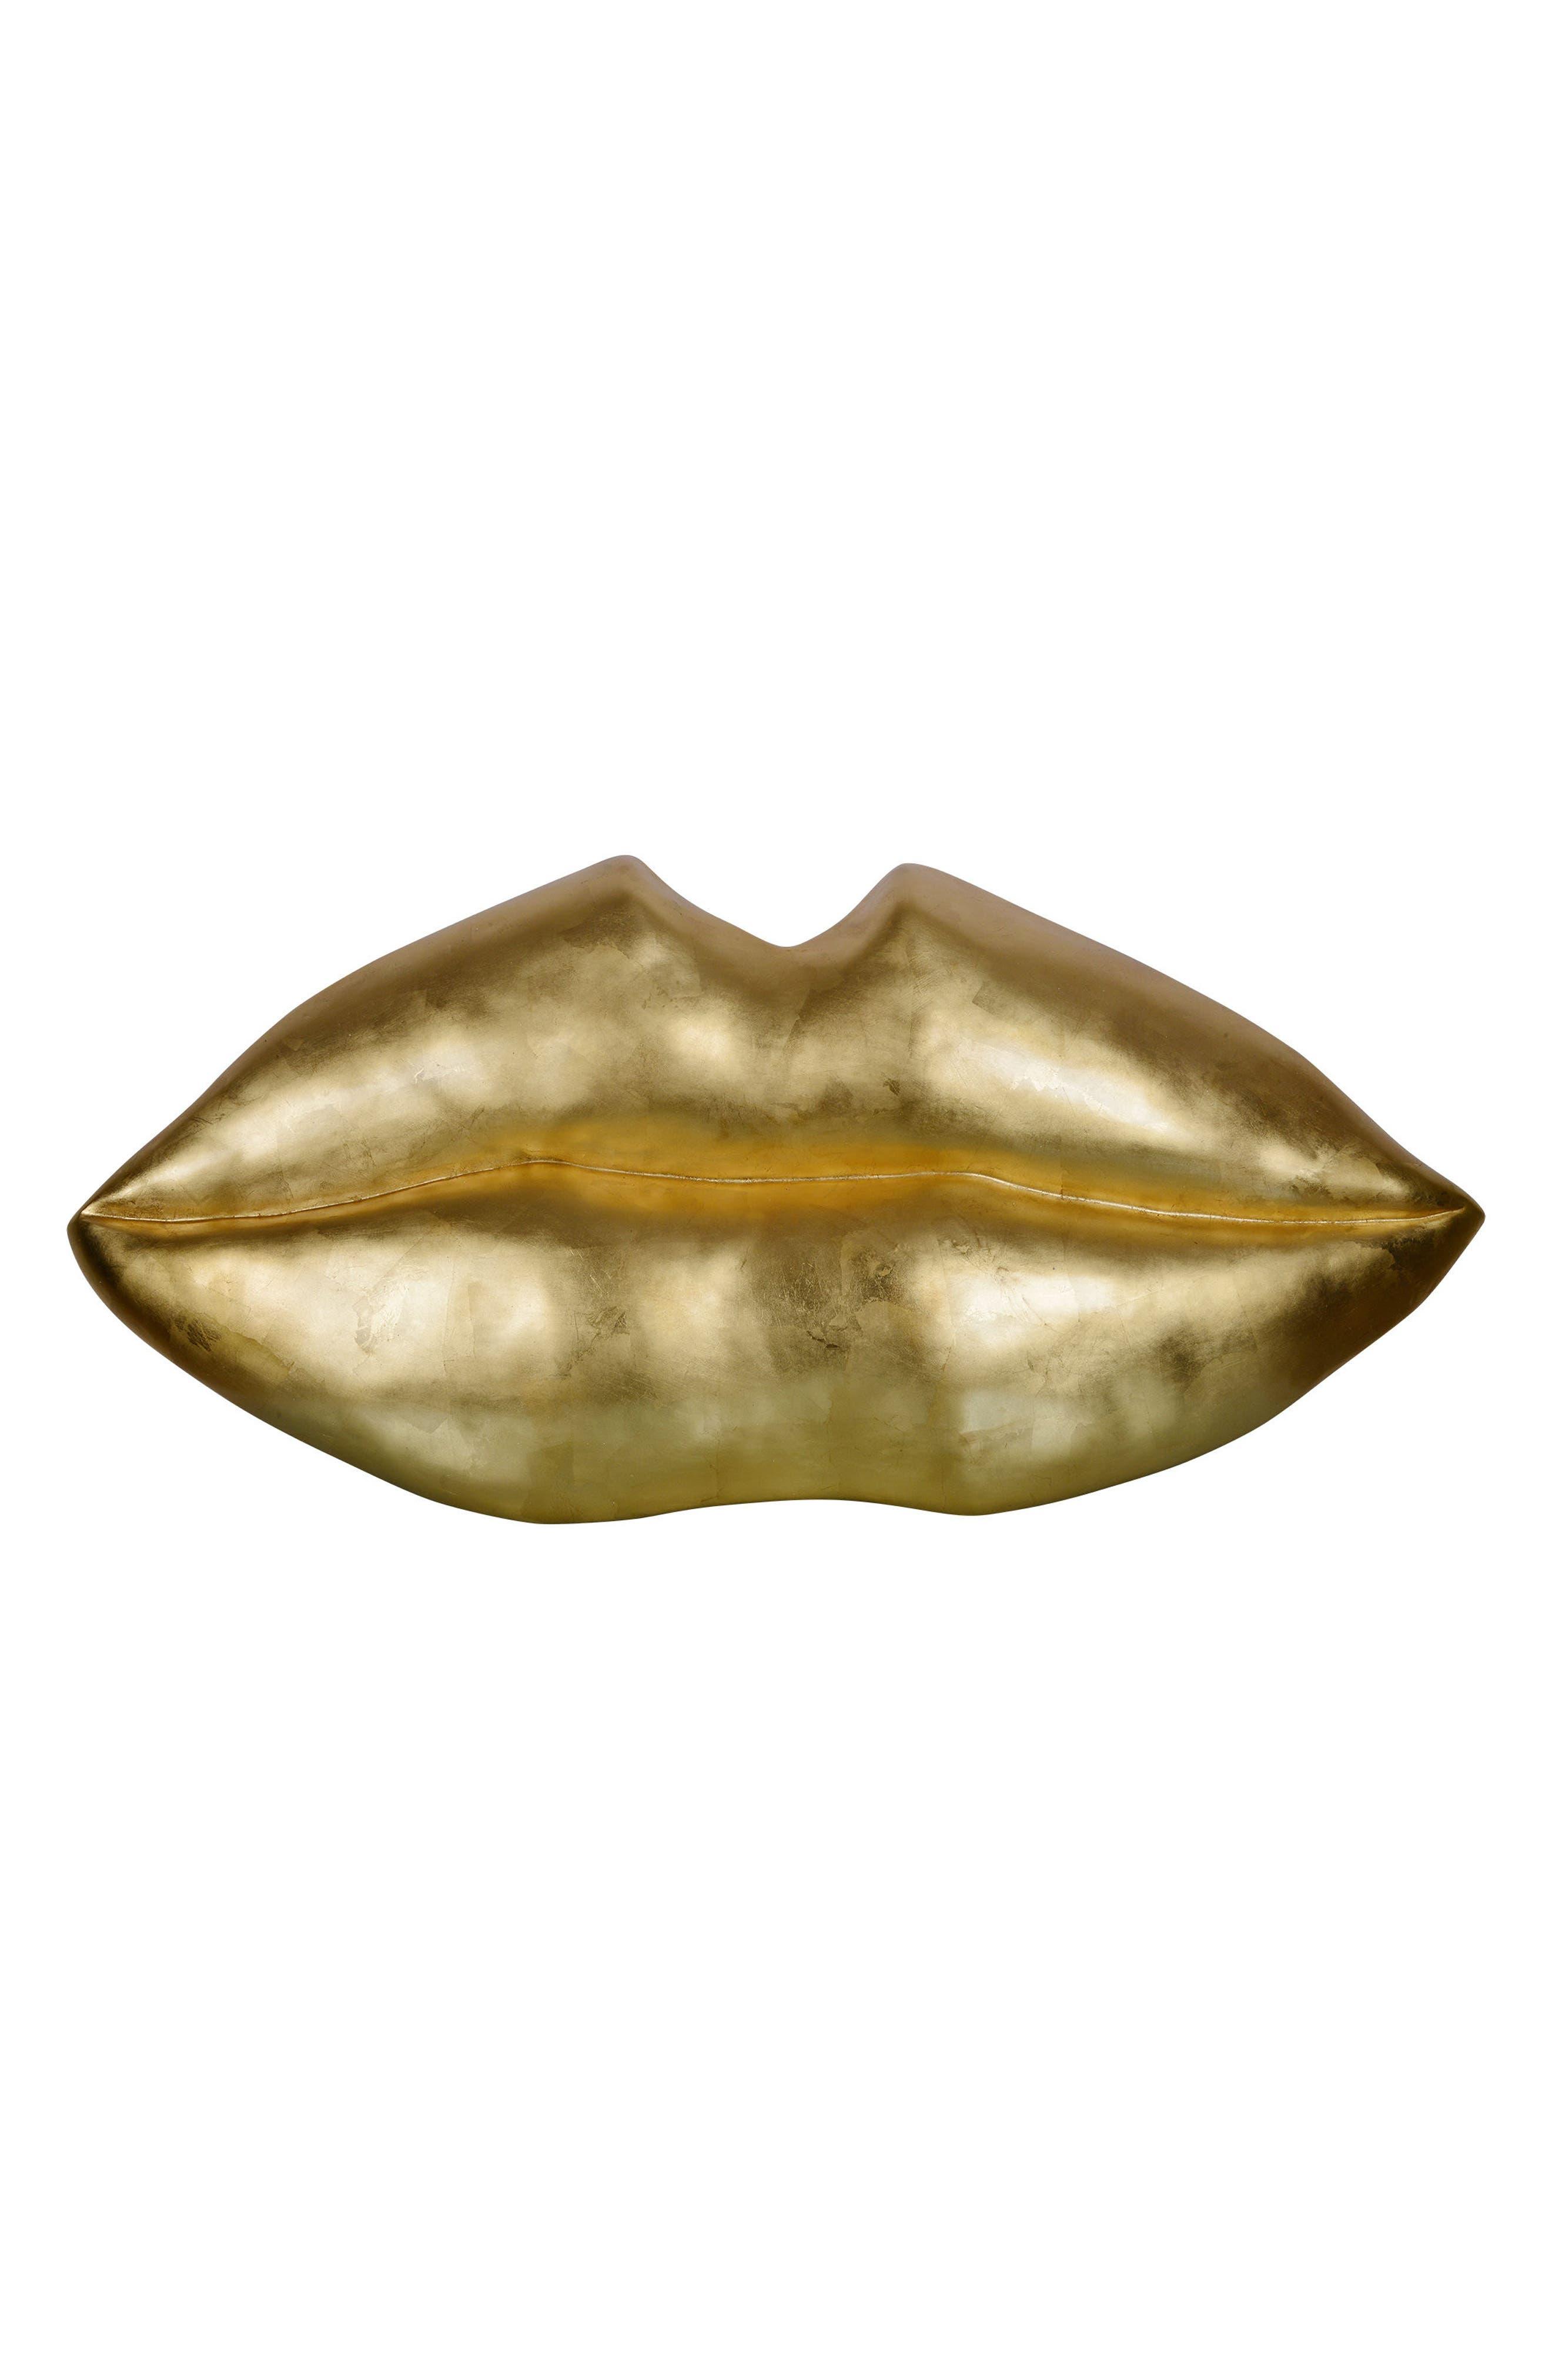 Alternate Image 1 Selected - Renwil Kiss Kiss Wall Art